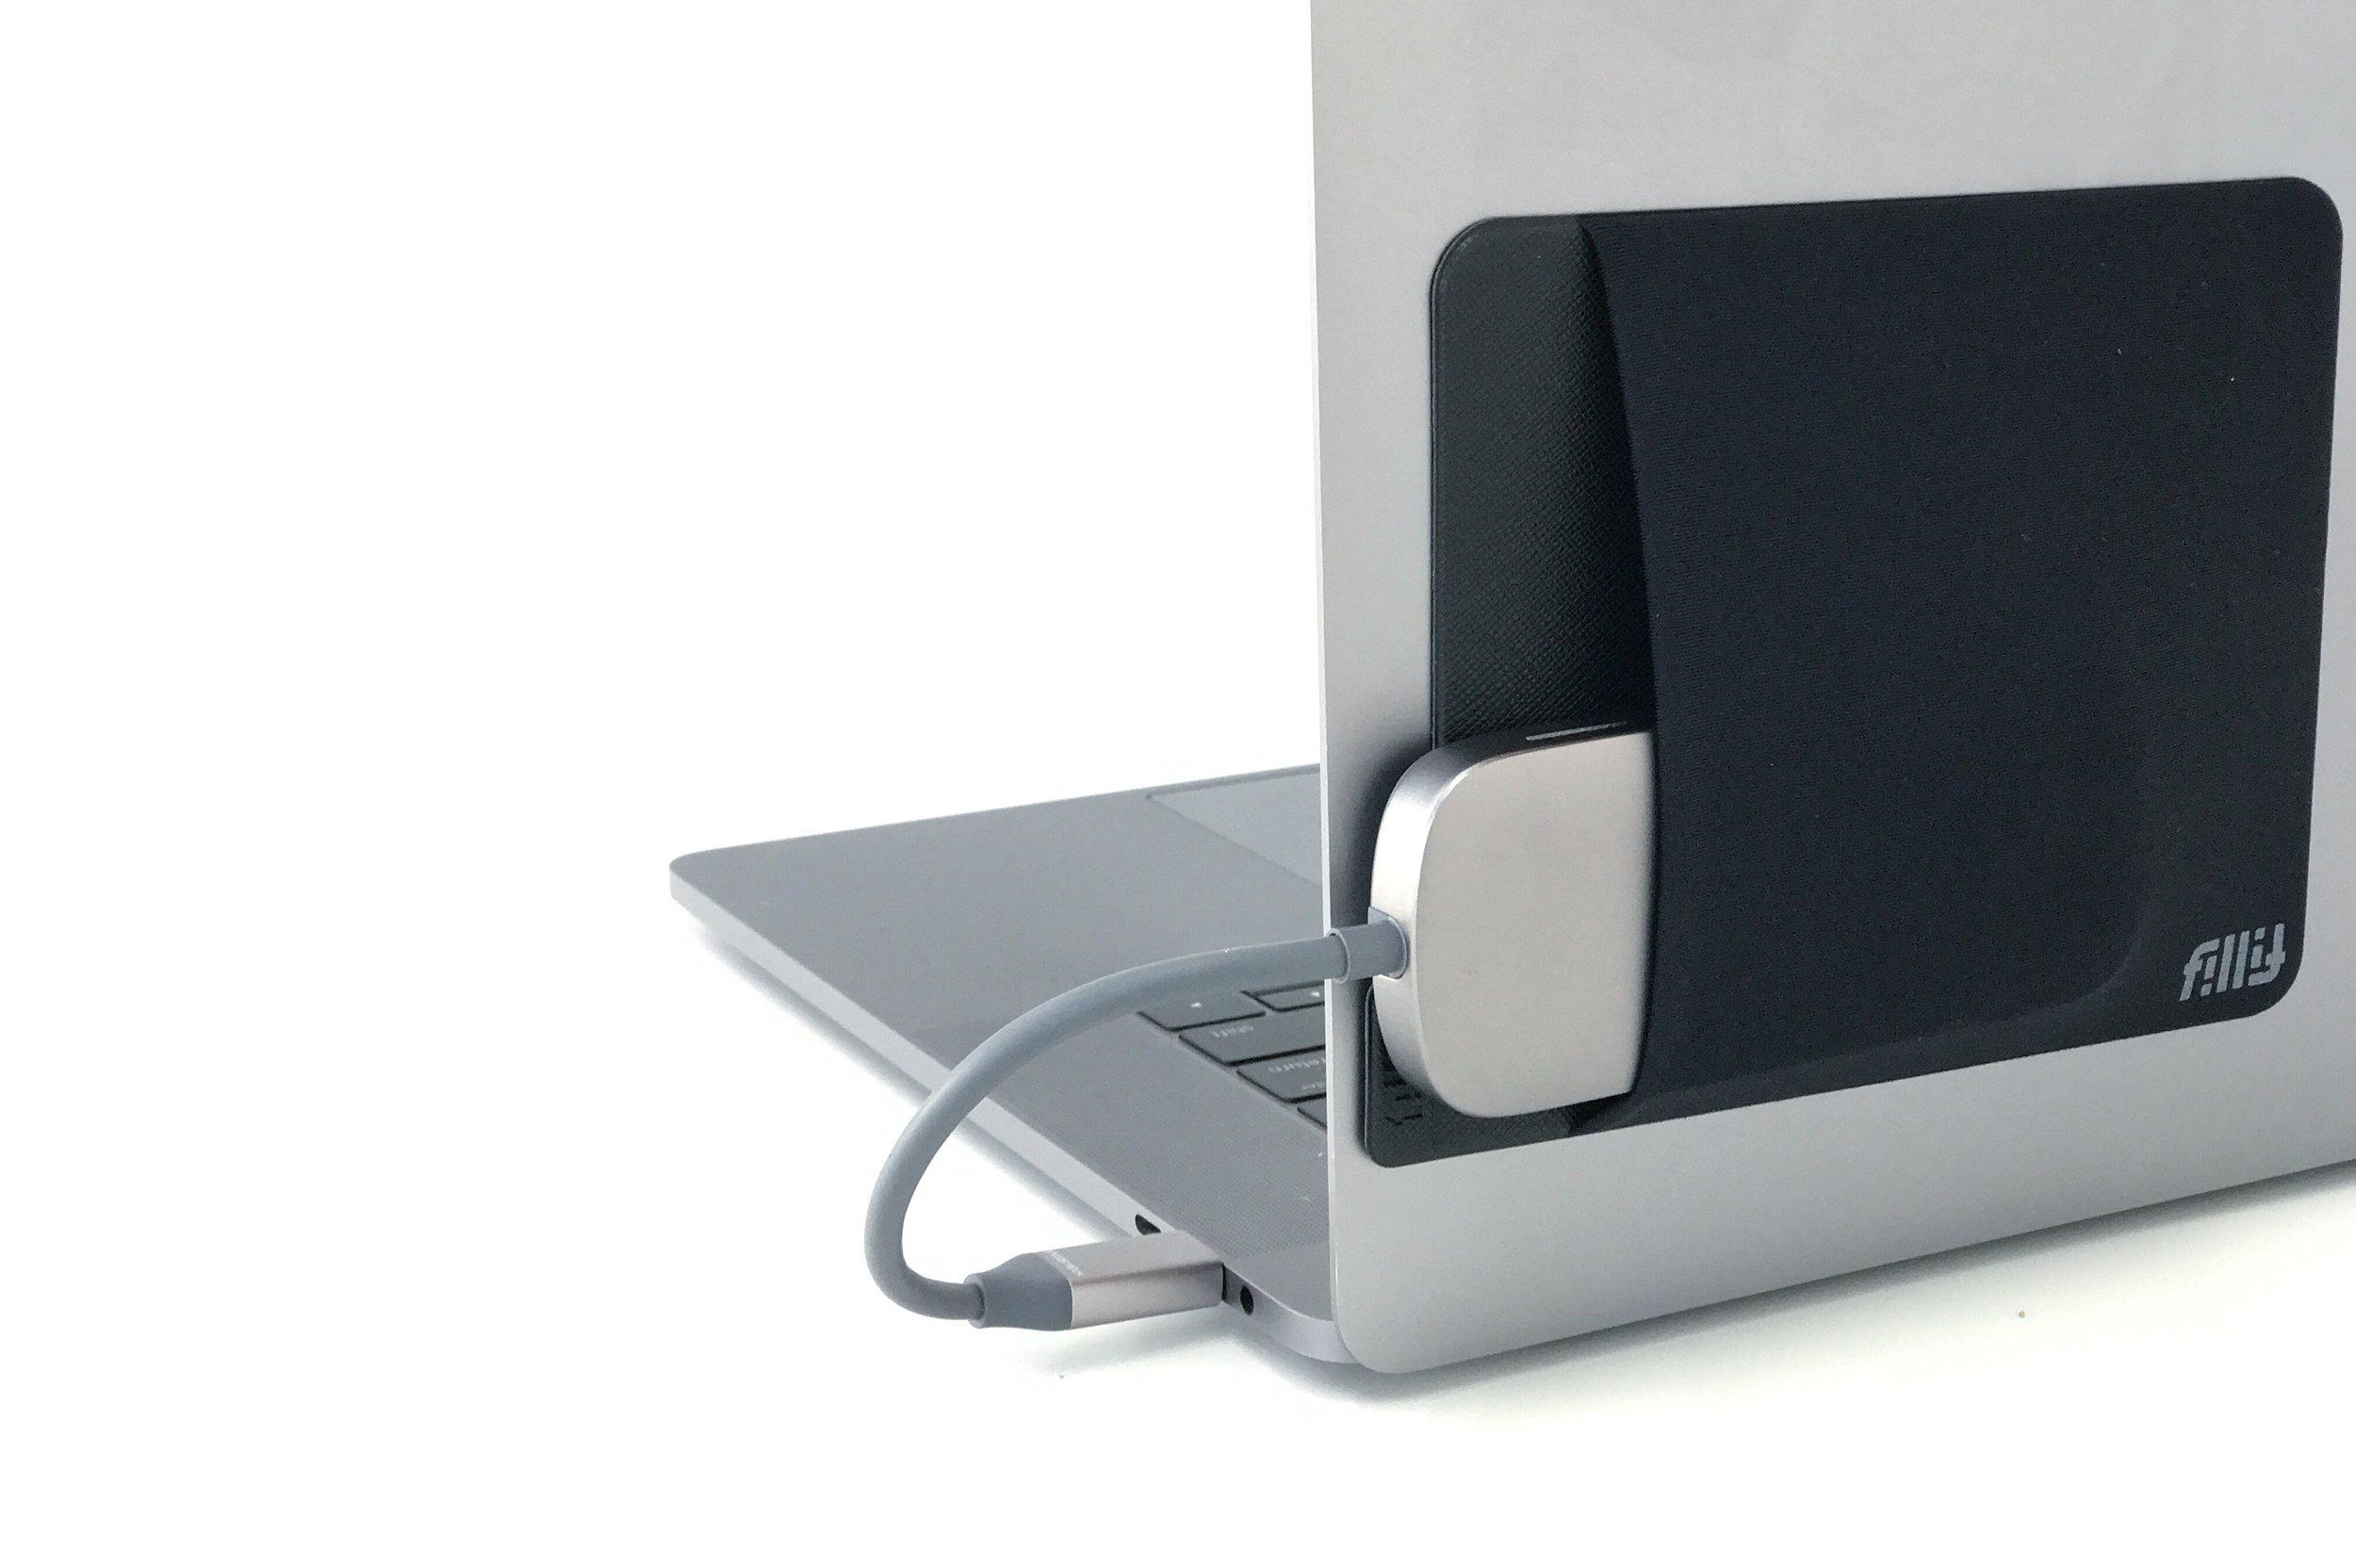 FillitPocket_Macbook_USBHub